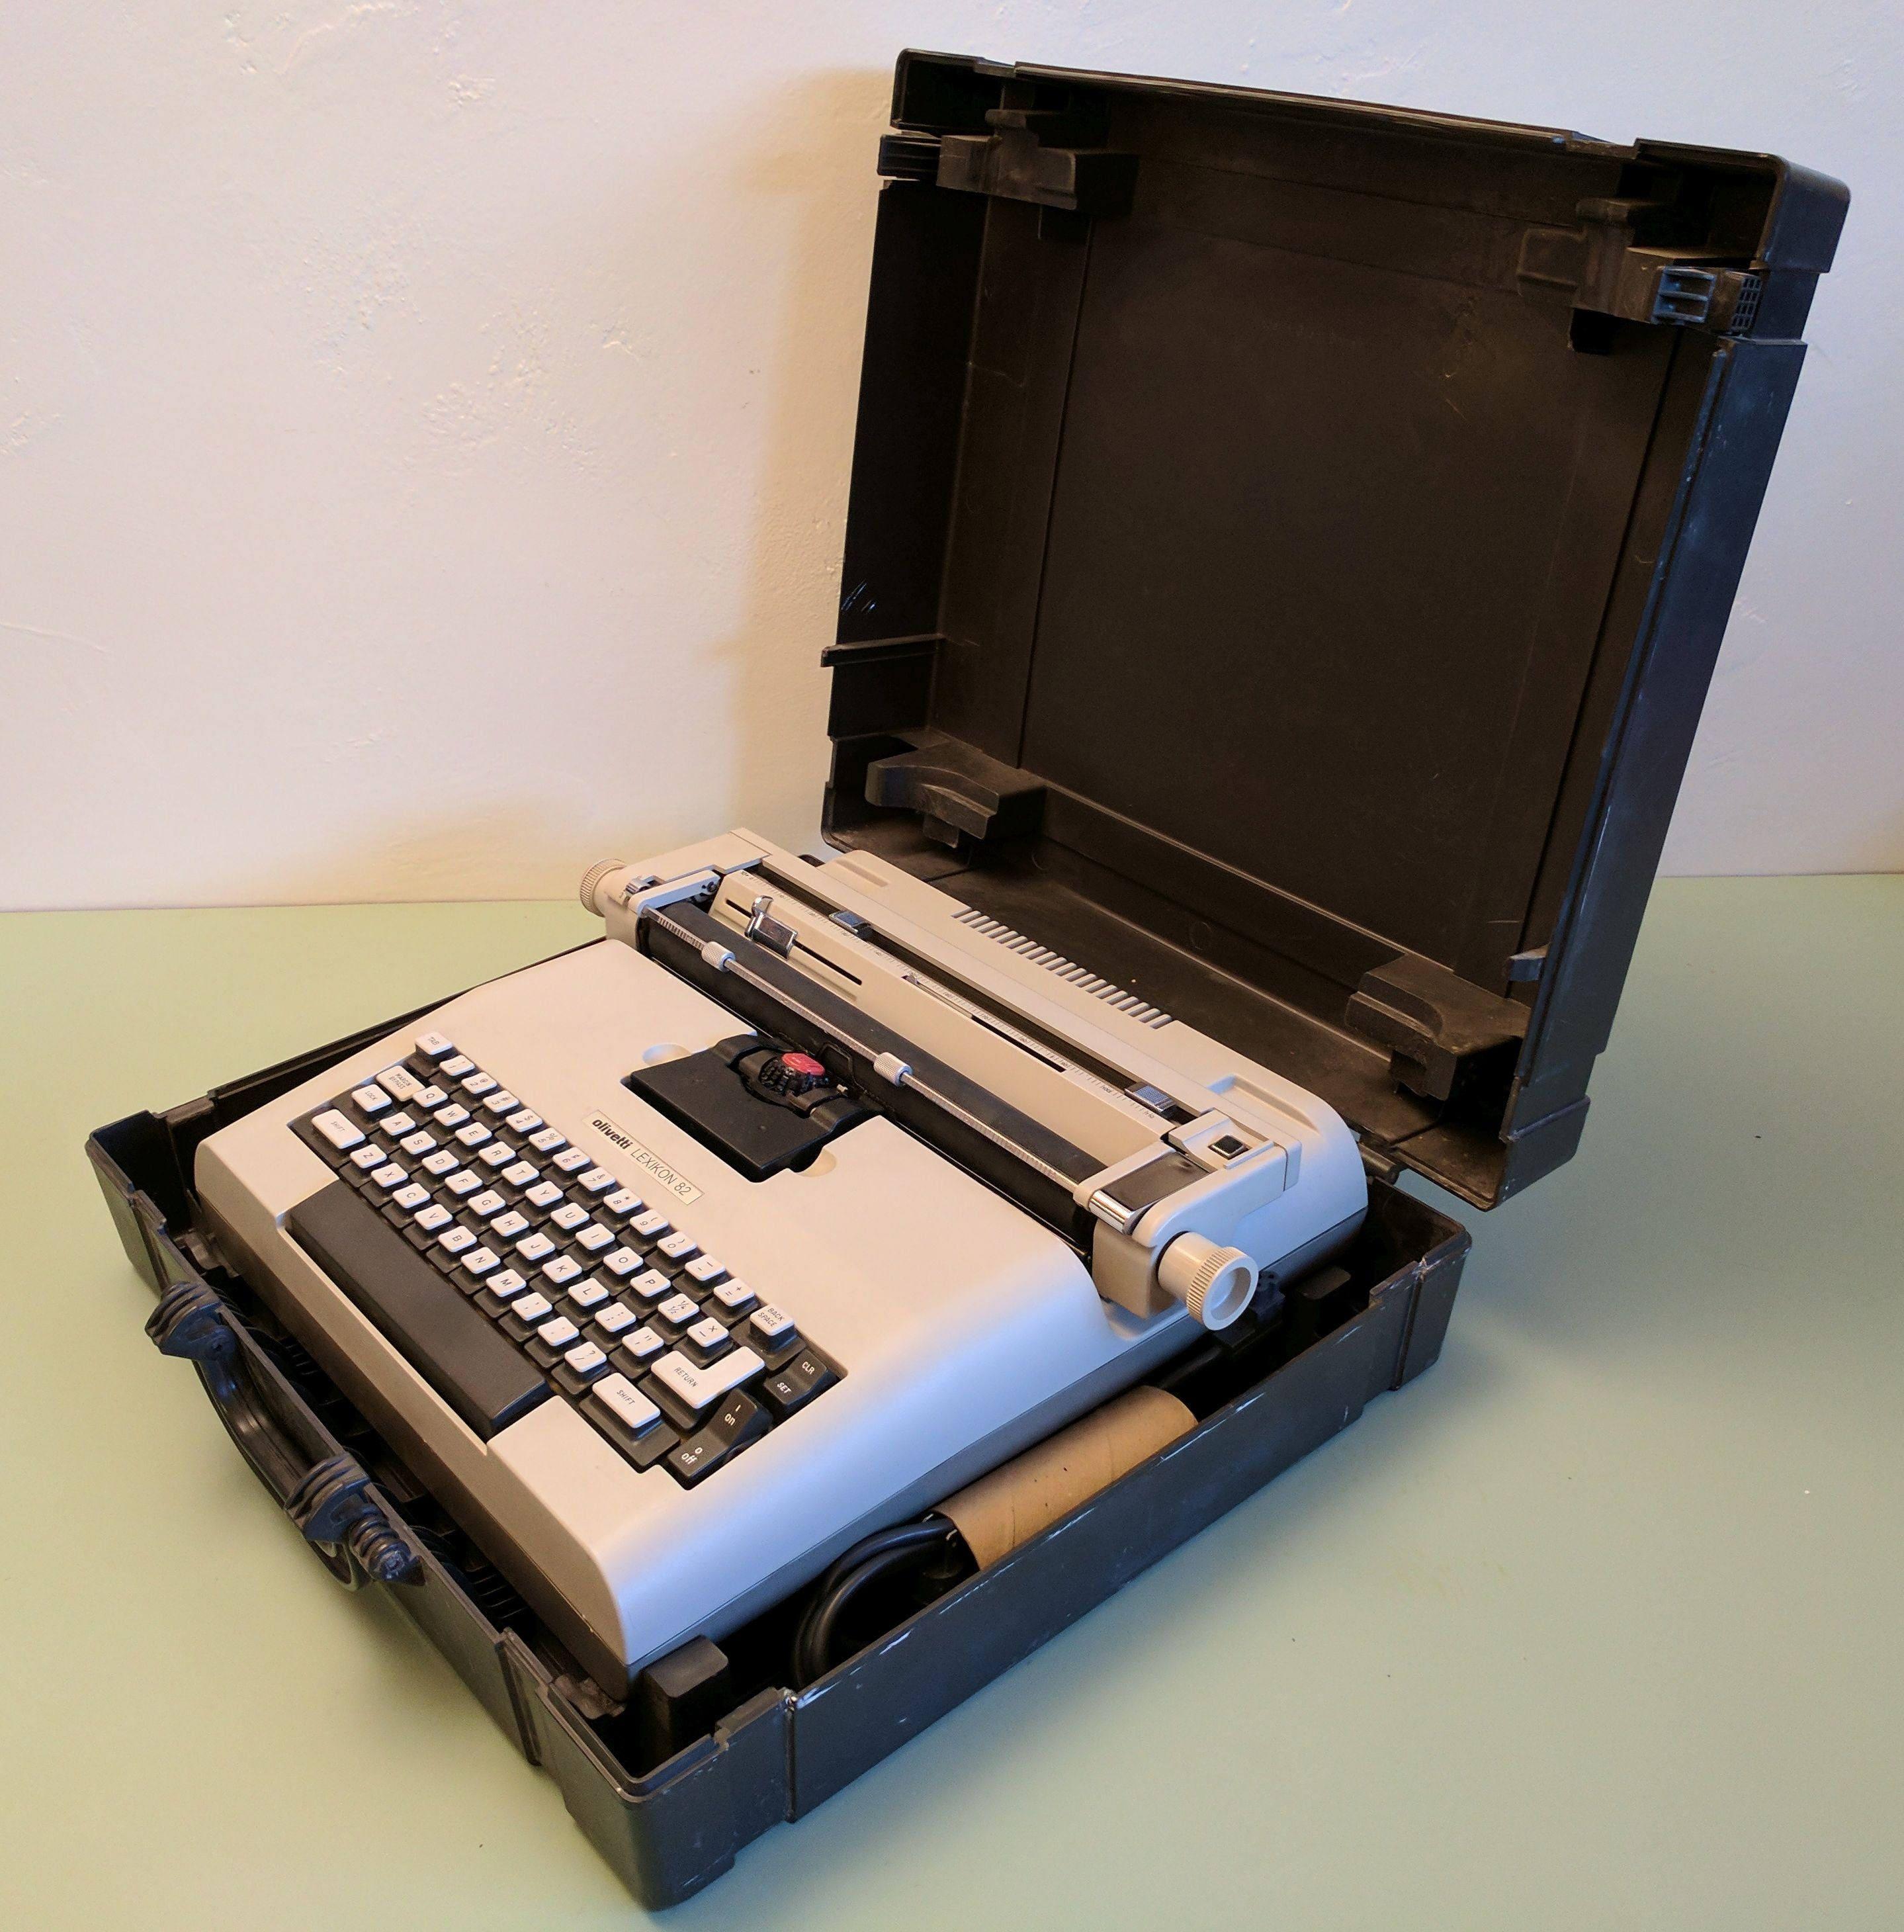 olivetti lexikon 82 electric typewriter and case